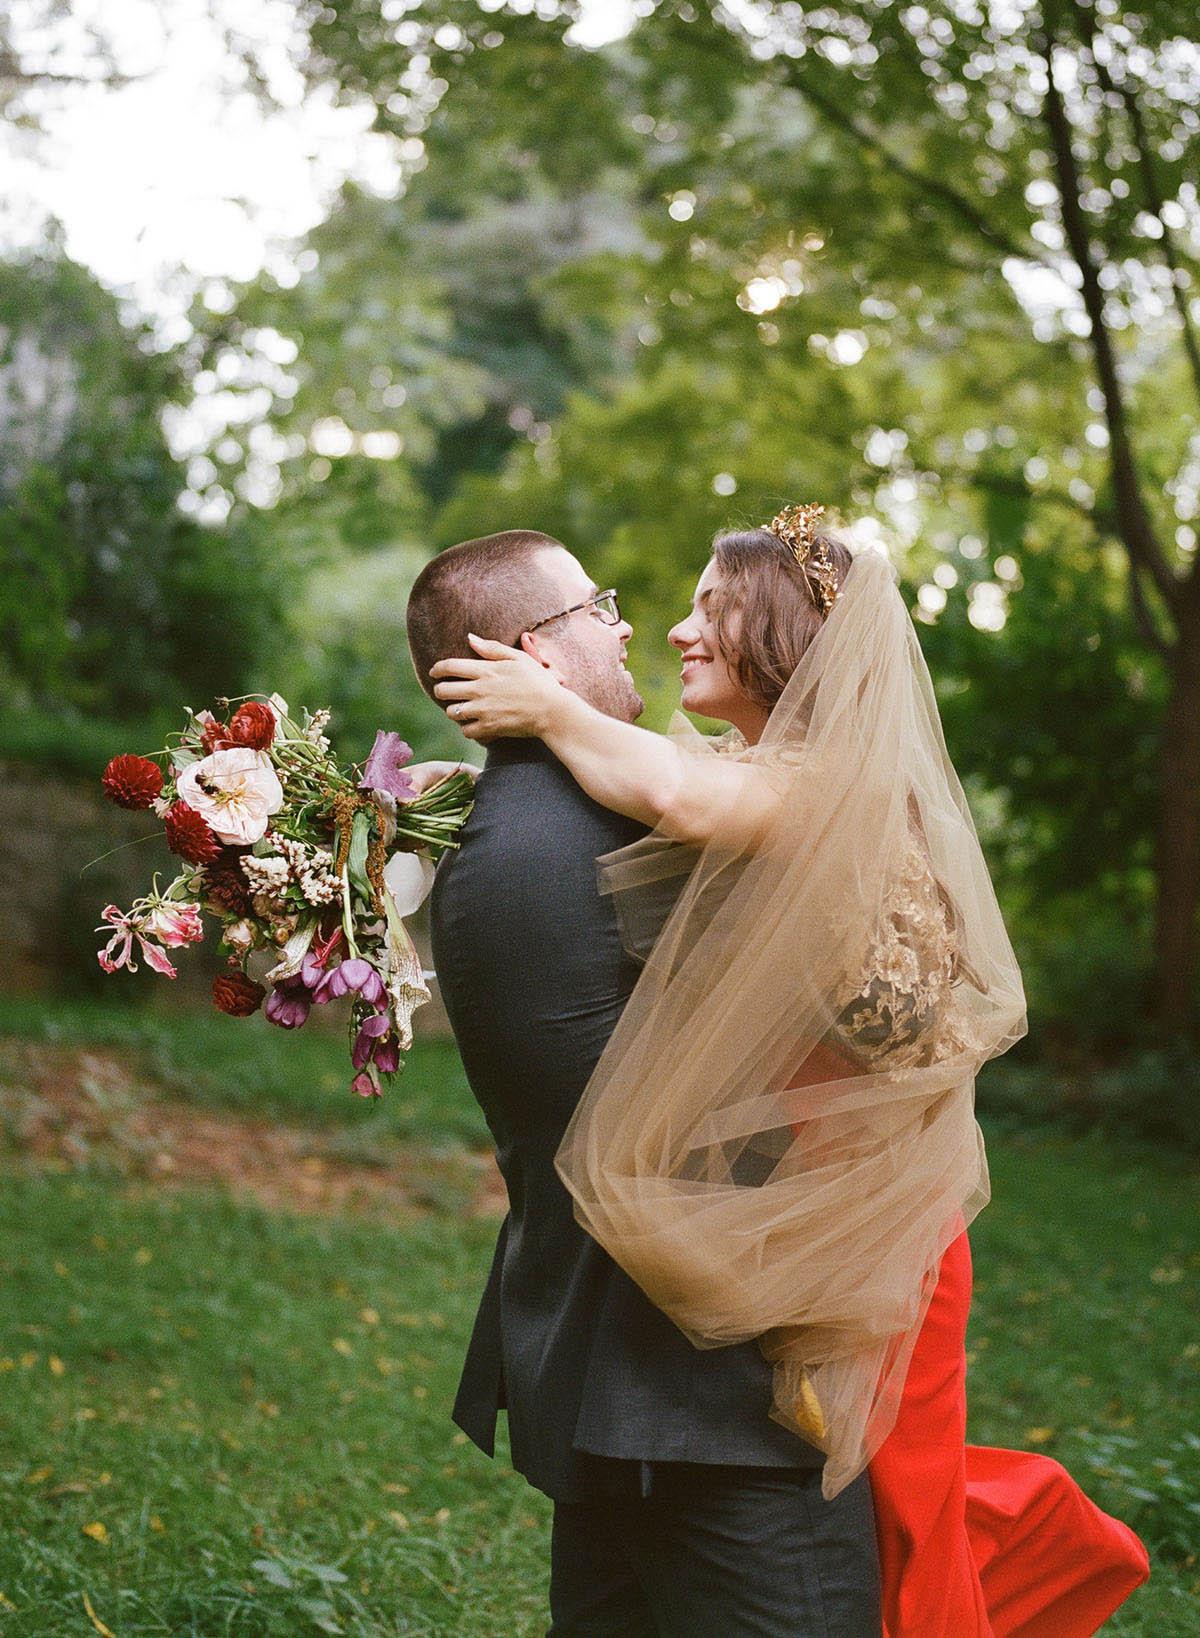 26-bold-bride-red-wedding-dress.jpg